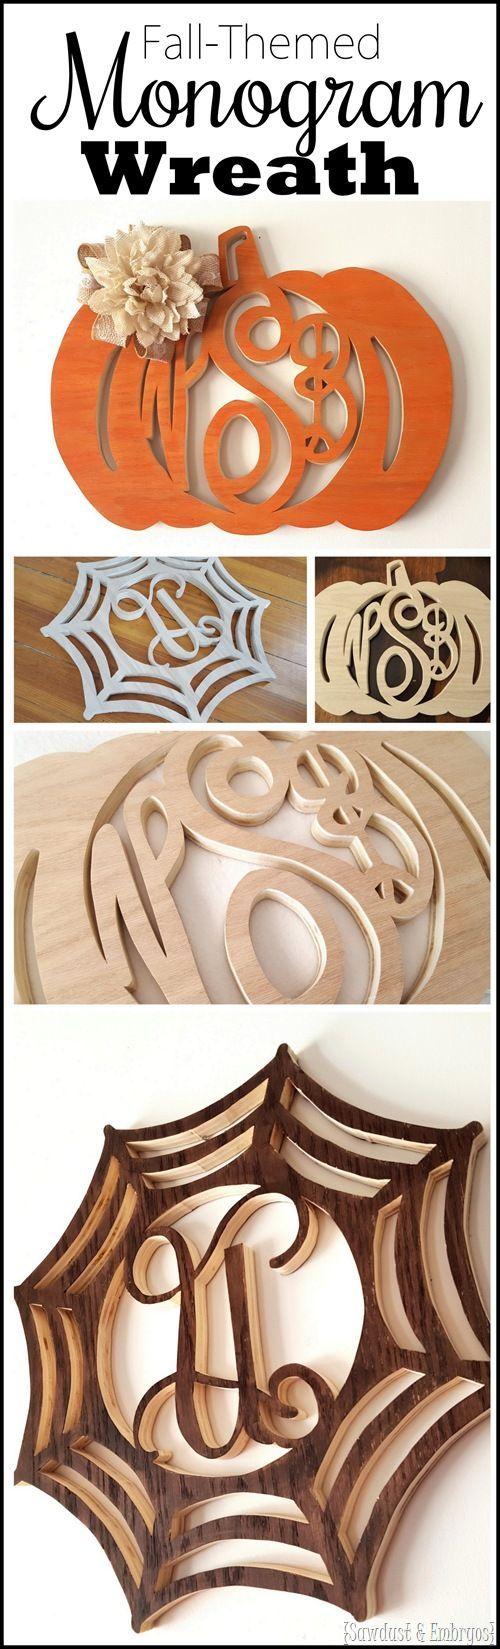 Make your own fall-themed monogram wreath using a scroll saw or jigsaw! {Reality Daydream}